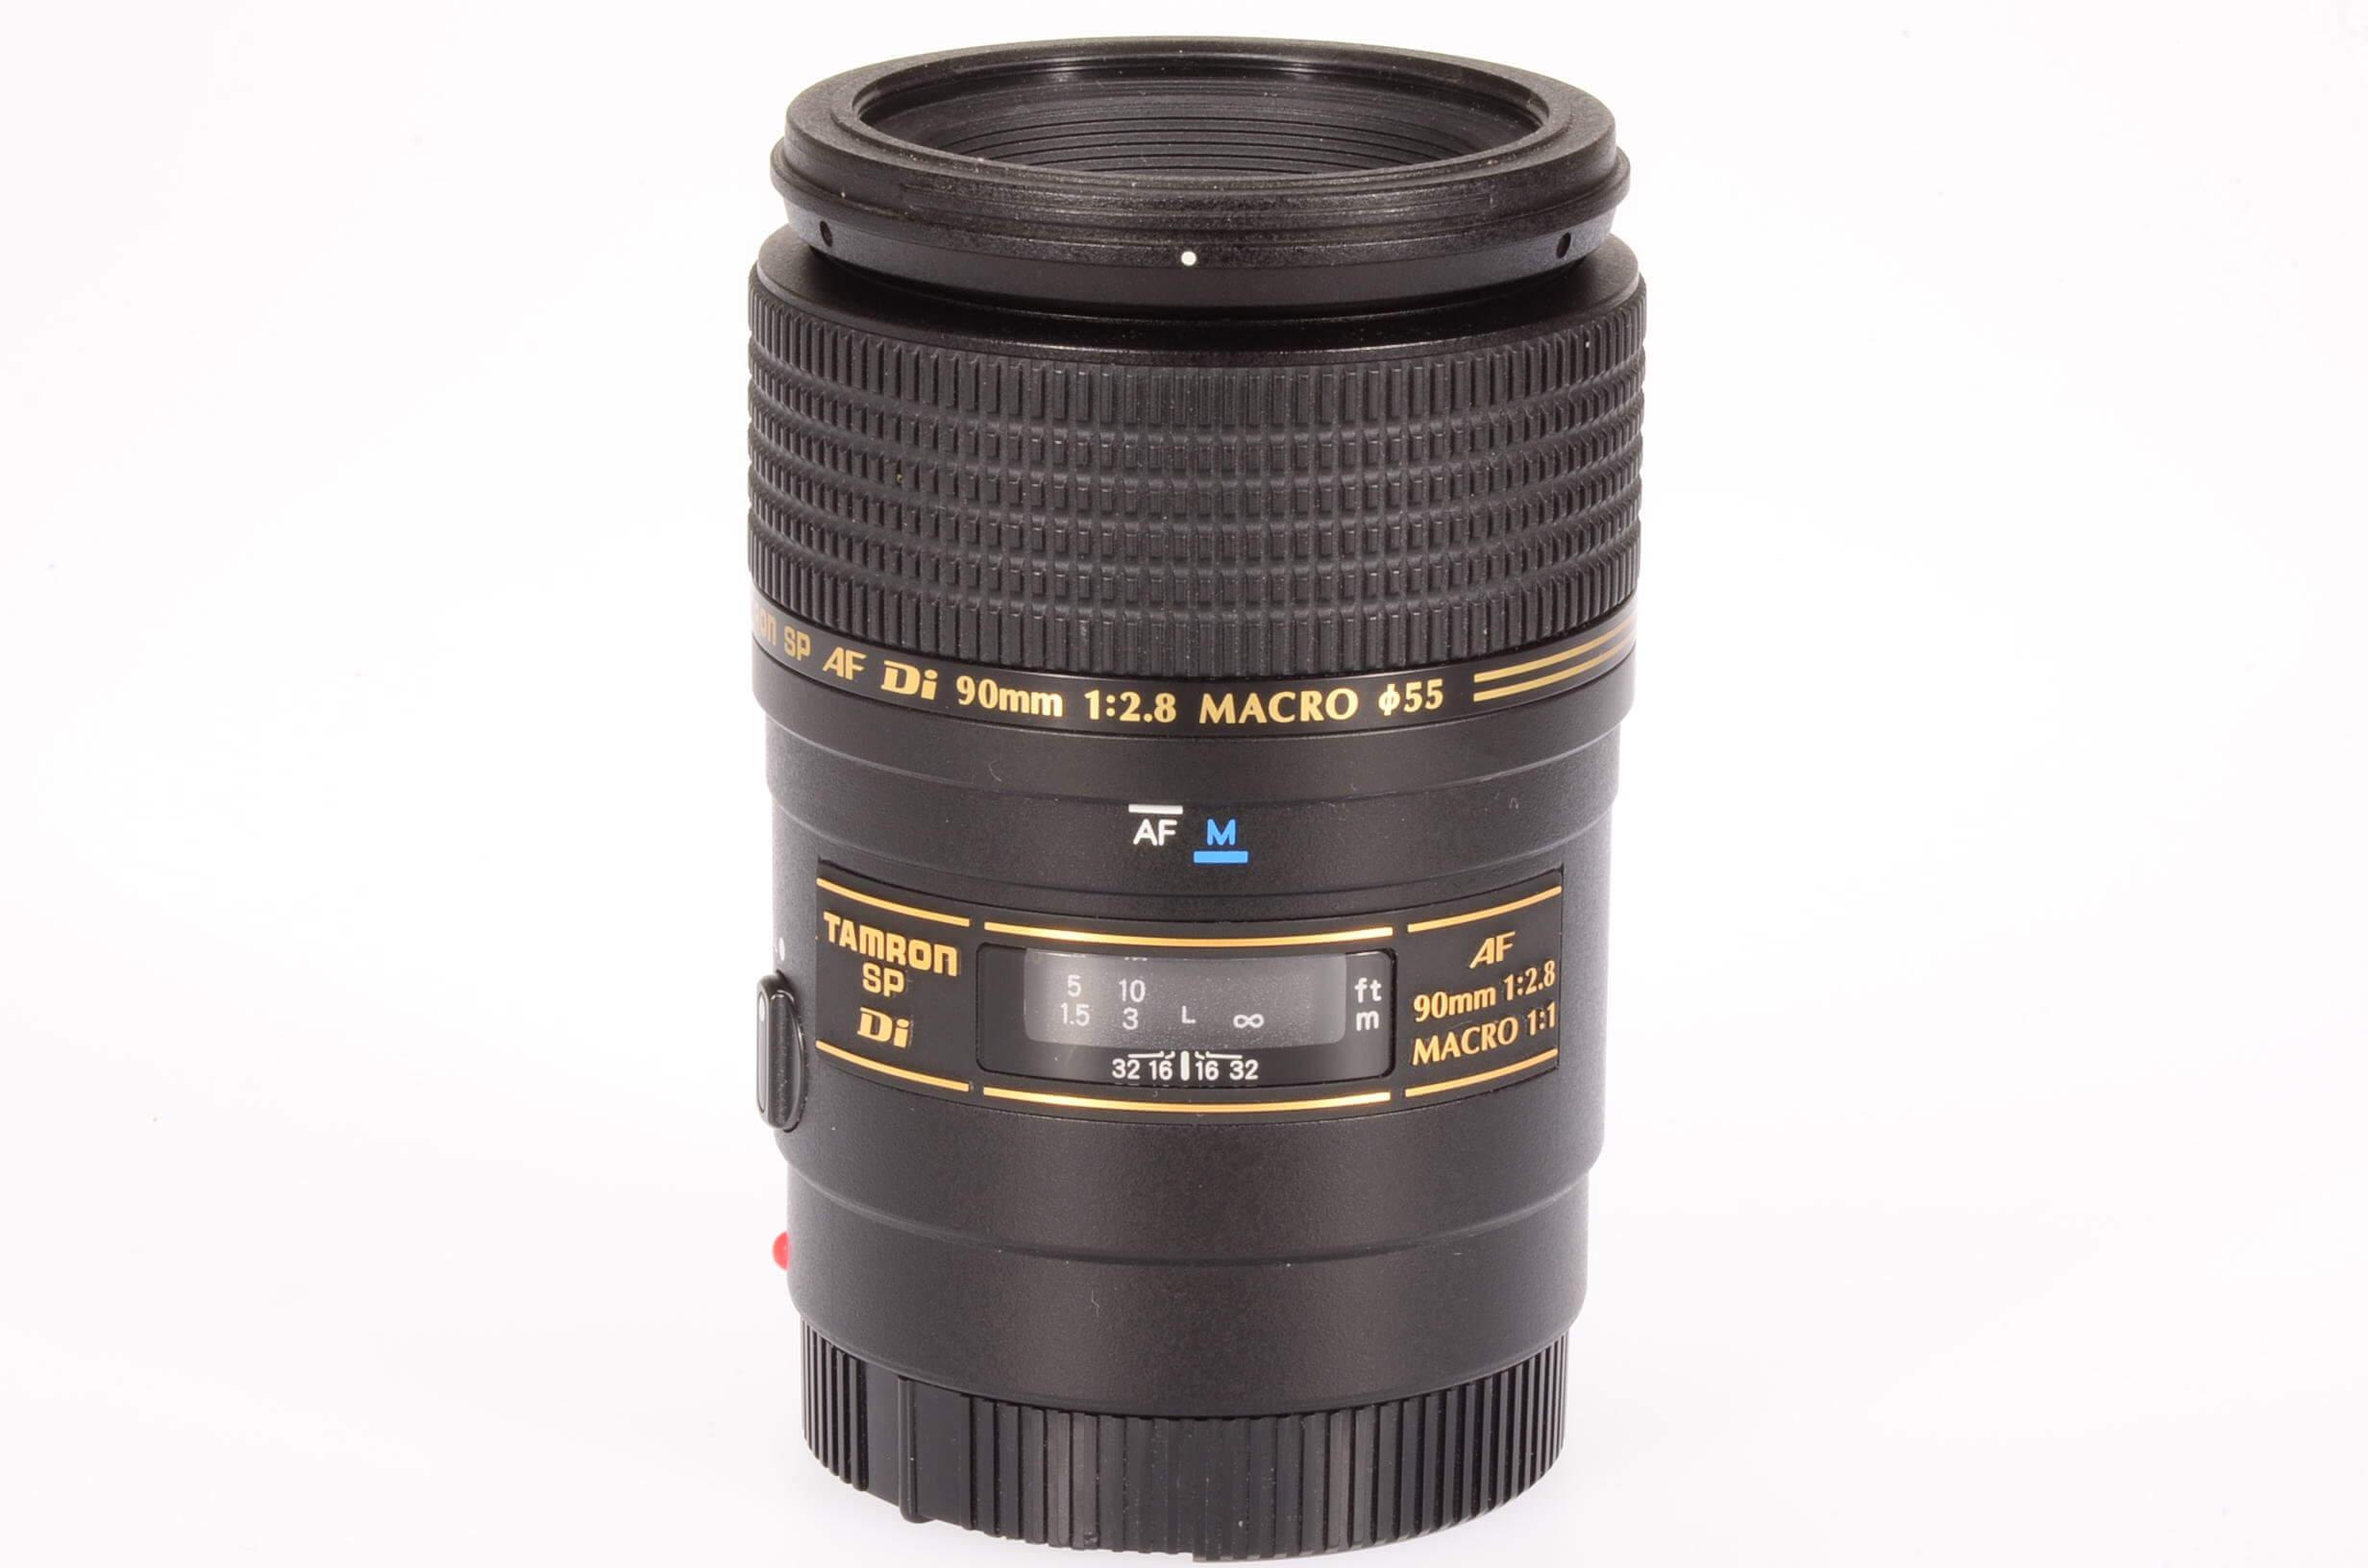 Tamron 90mm f2.8 Macro 1:1 SP Di lens, Sony/Minolta mount